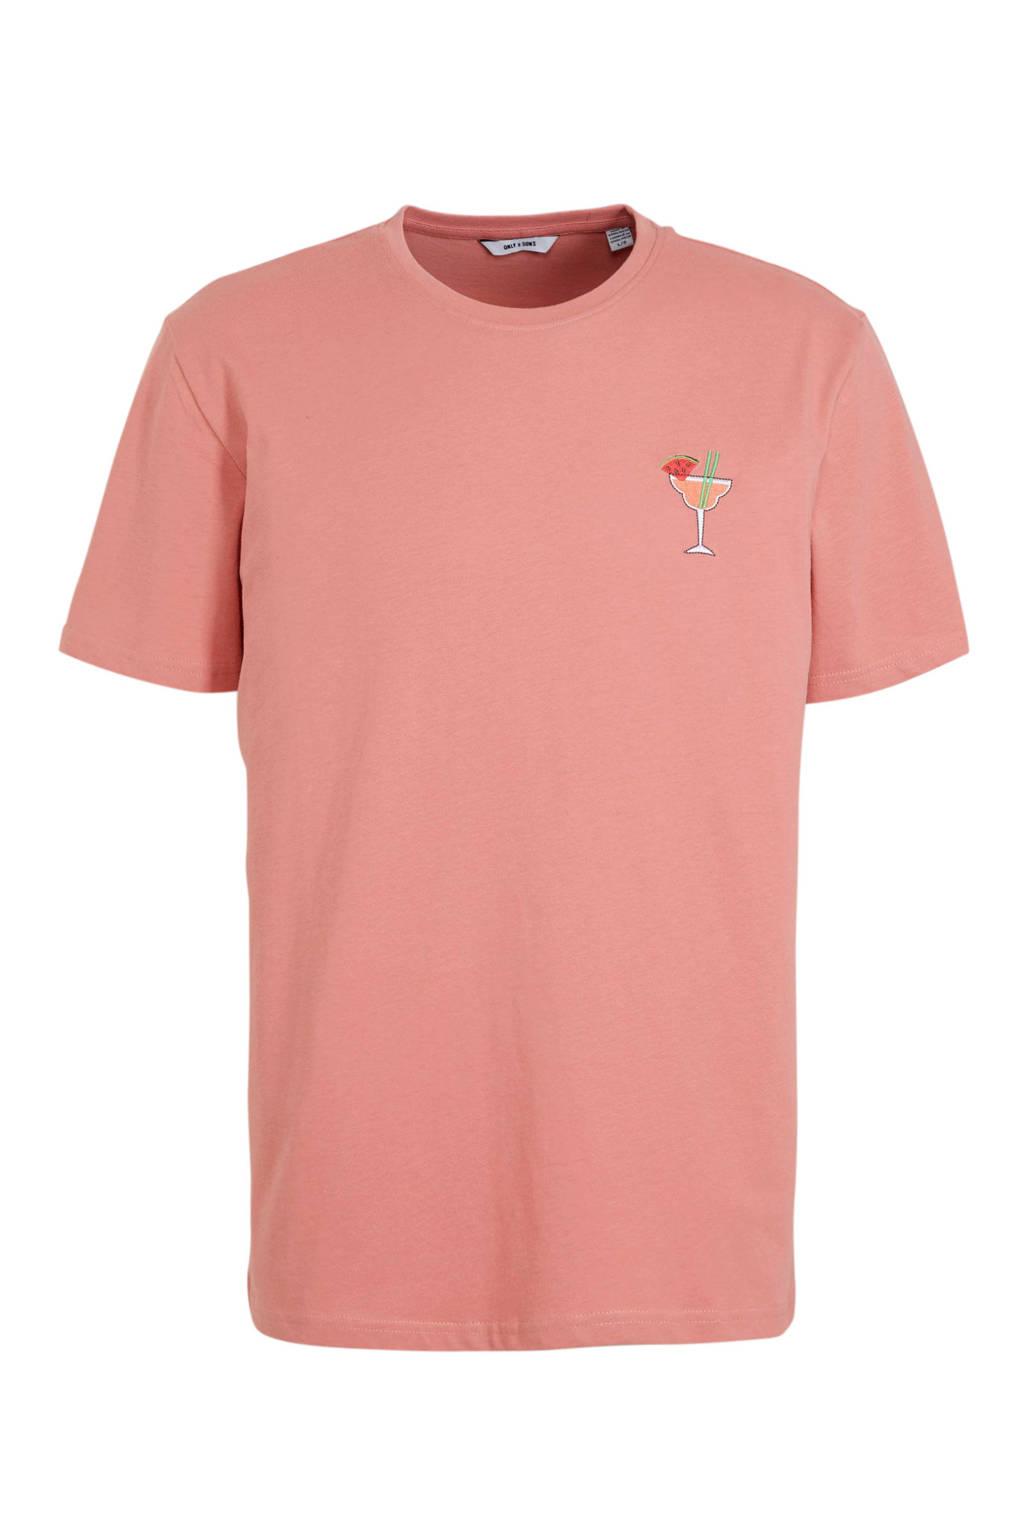 ONLY & SONS T-shirt met printopdruk roze, Roze